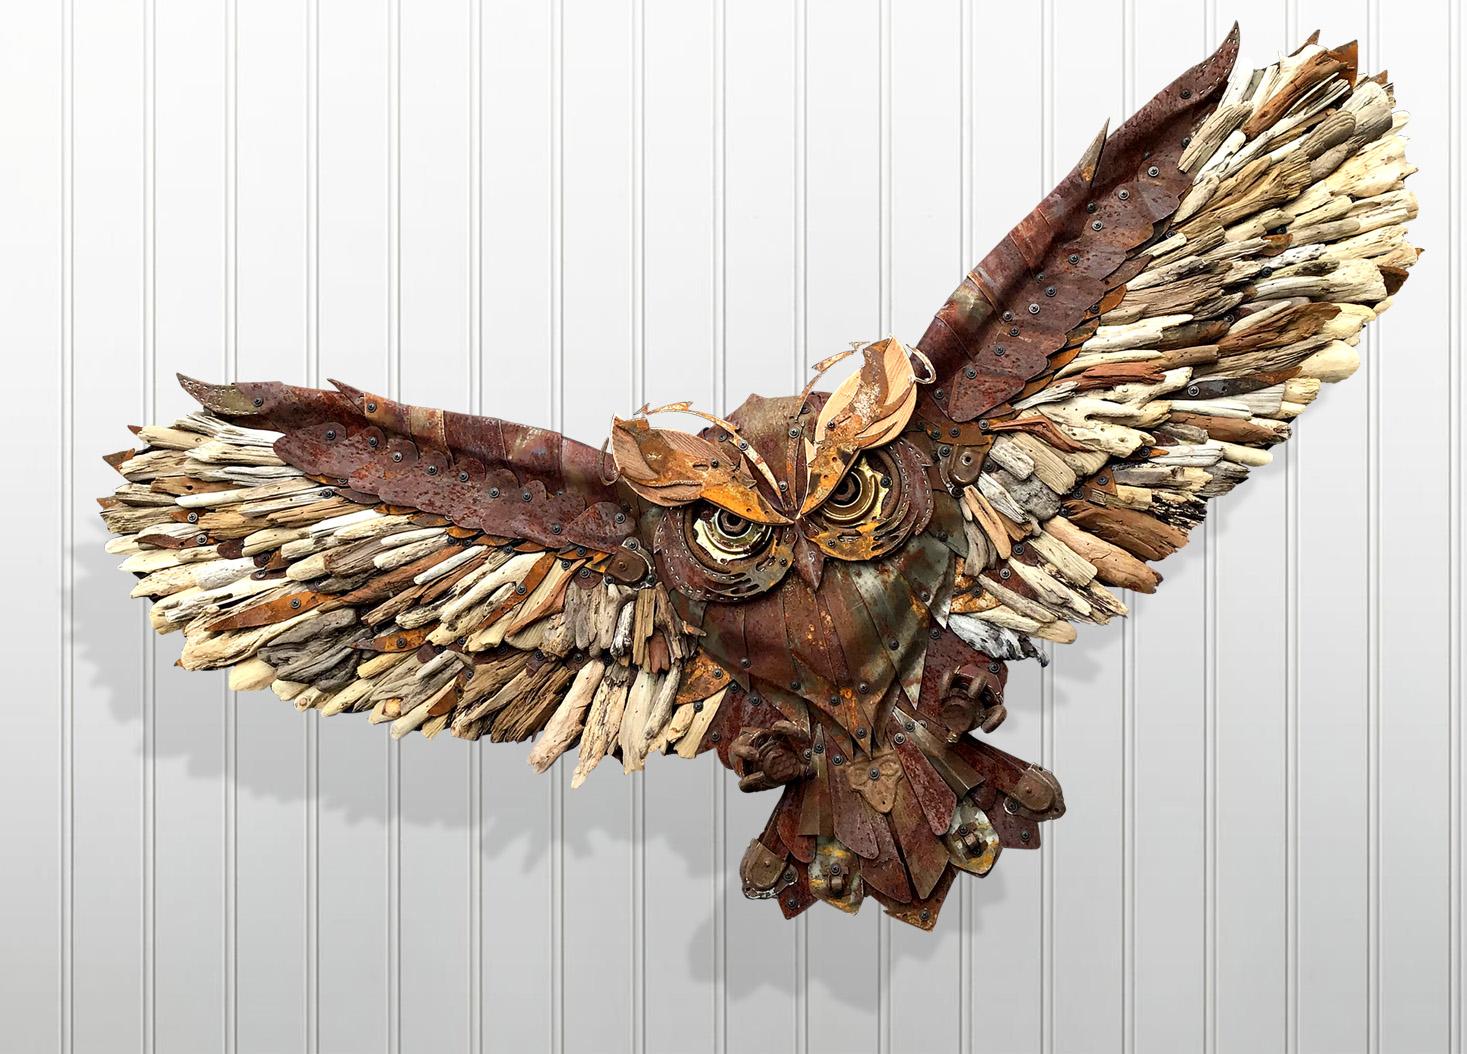 Owl by Dan Kangas